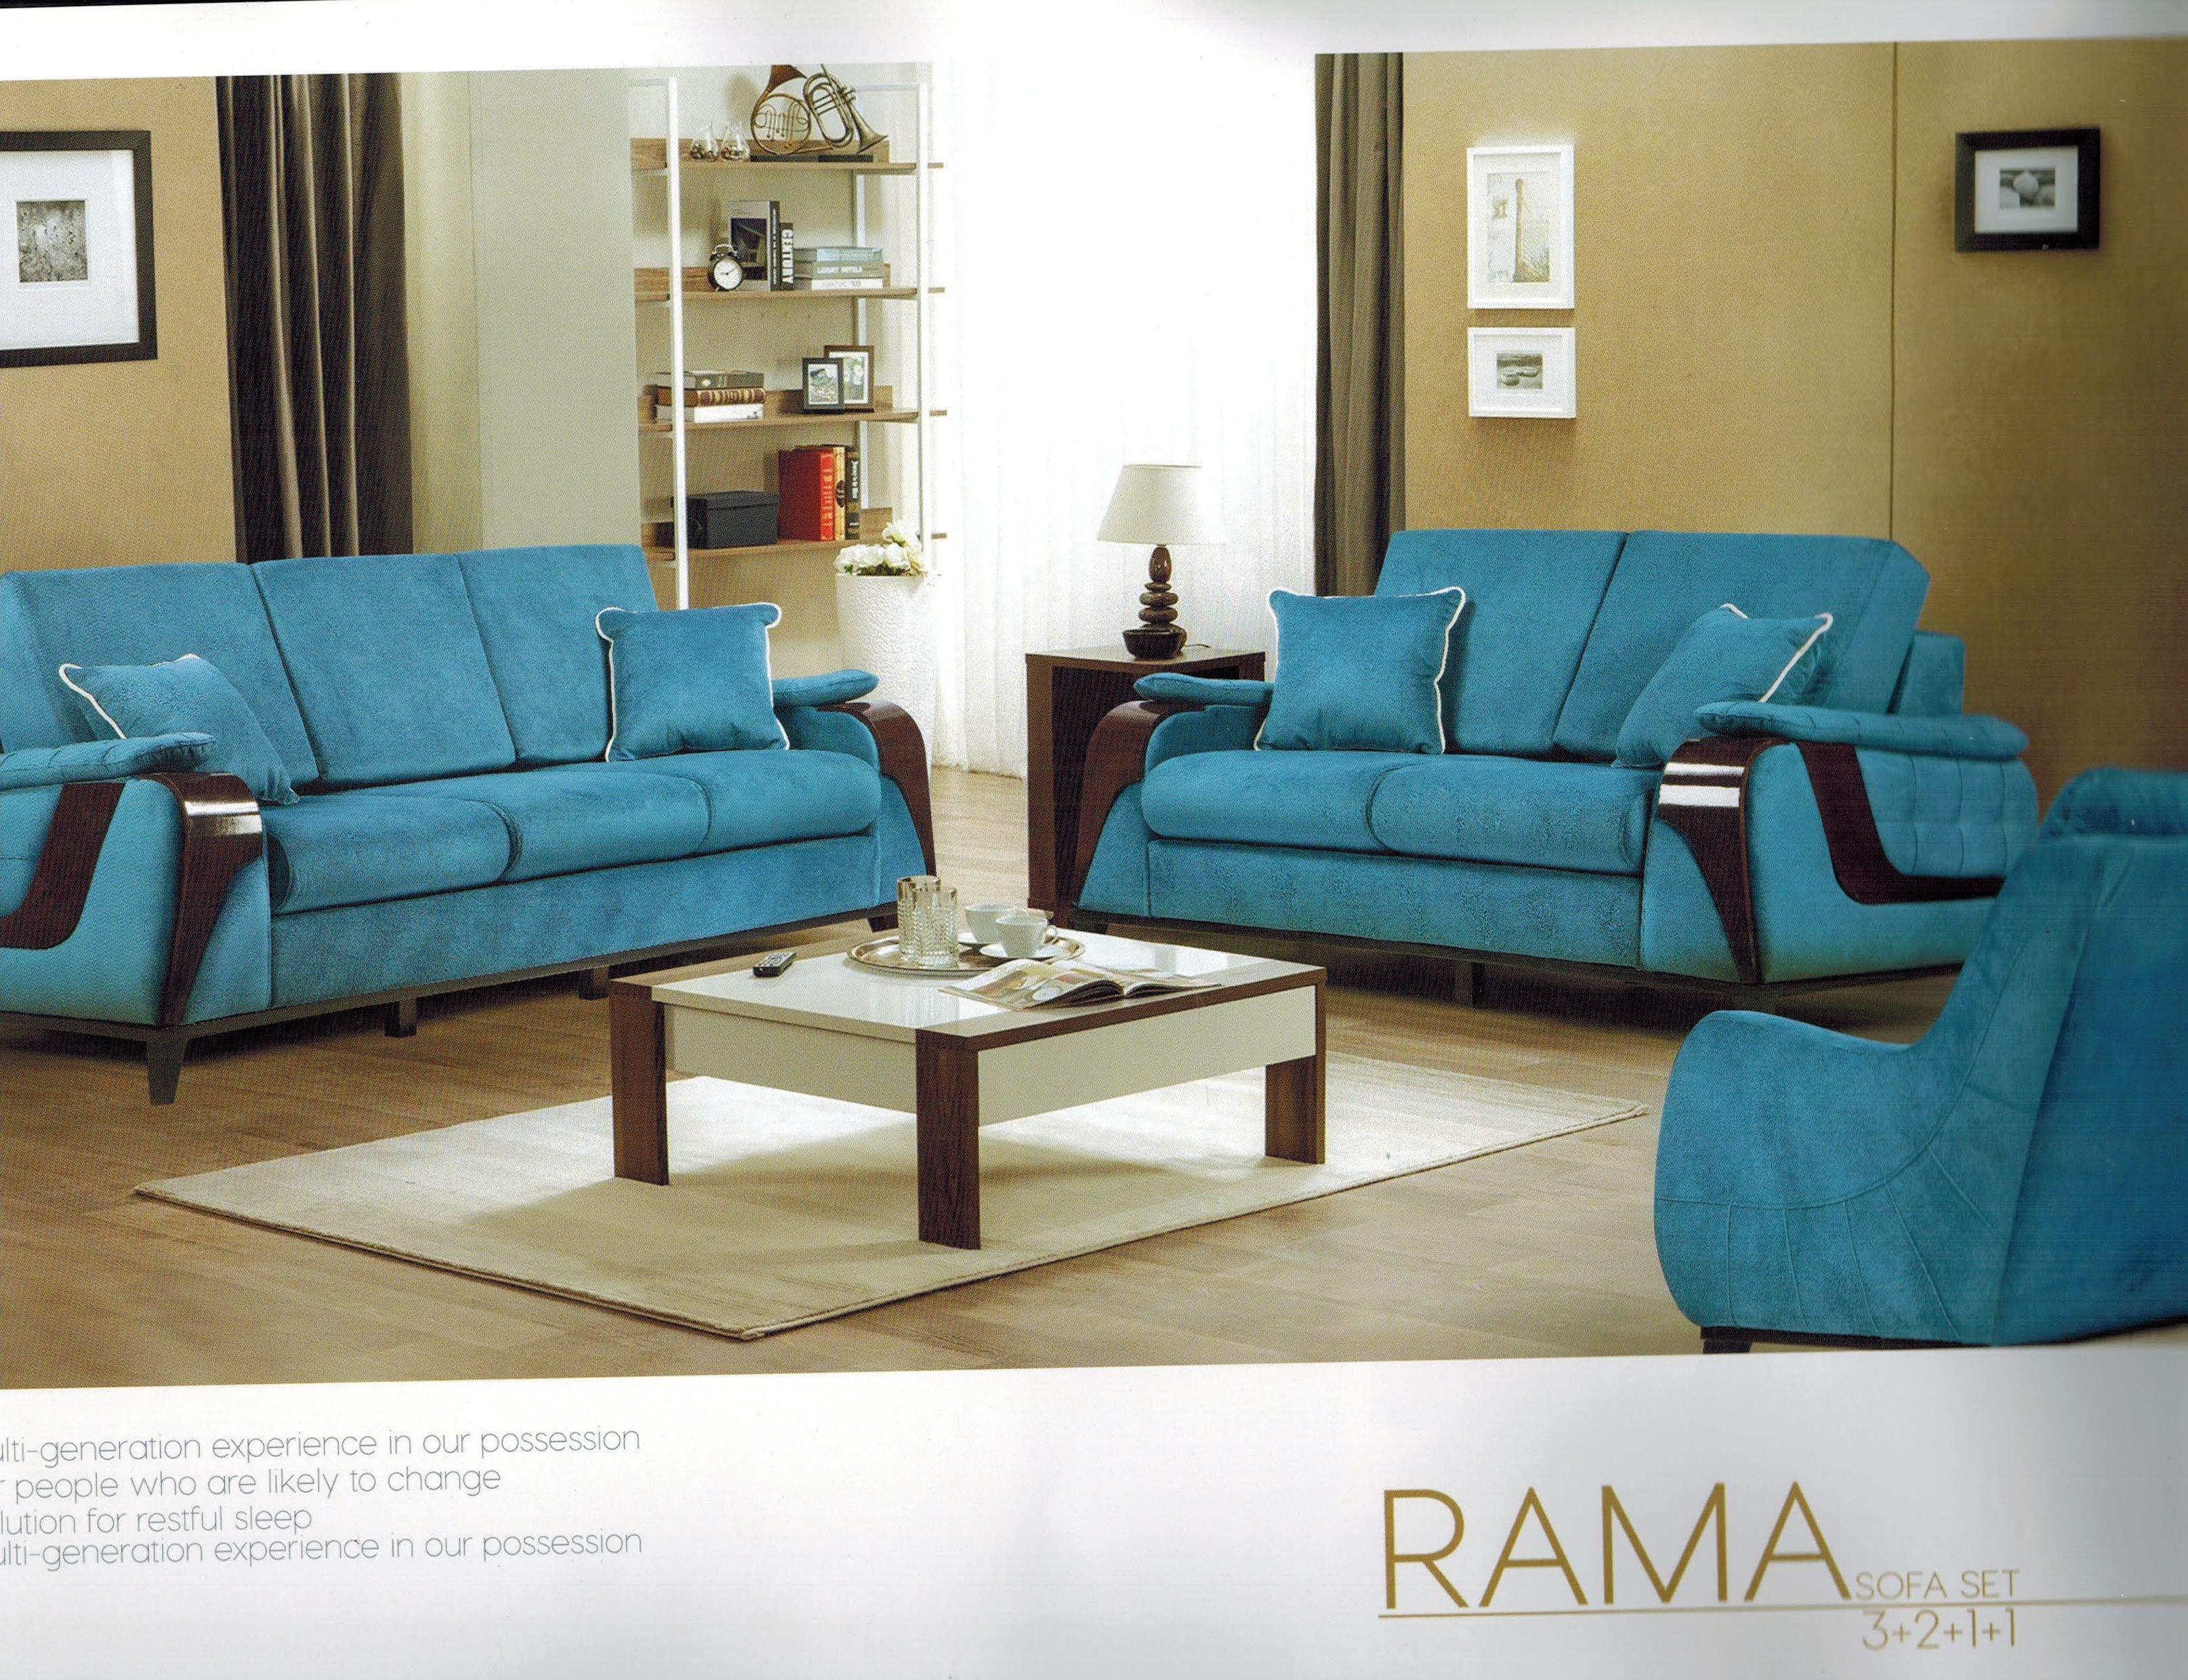 سرویس مبلمان مدل  راما  MODEL: rama